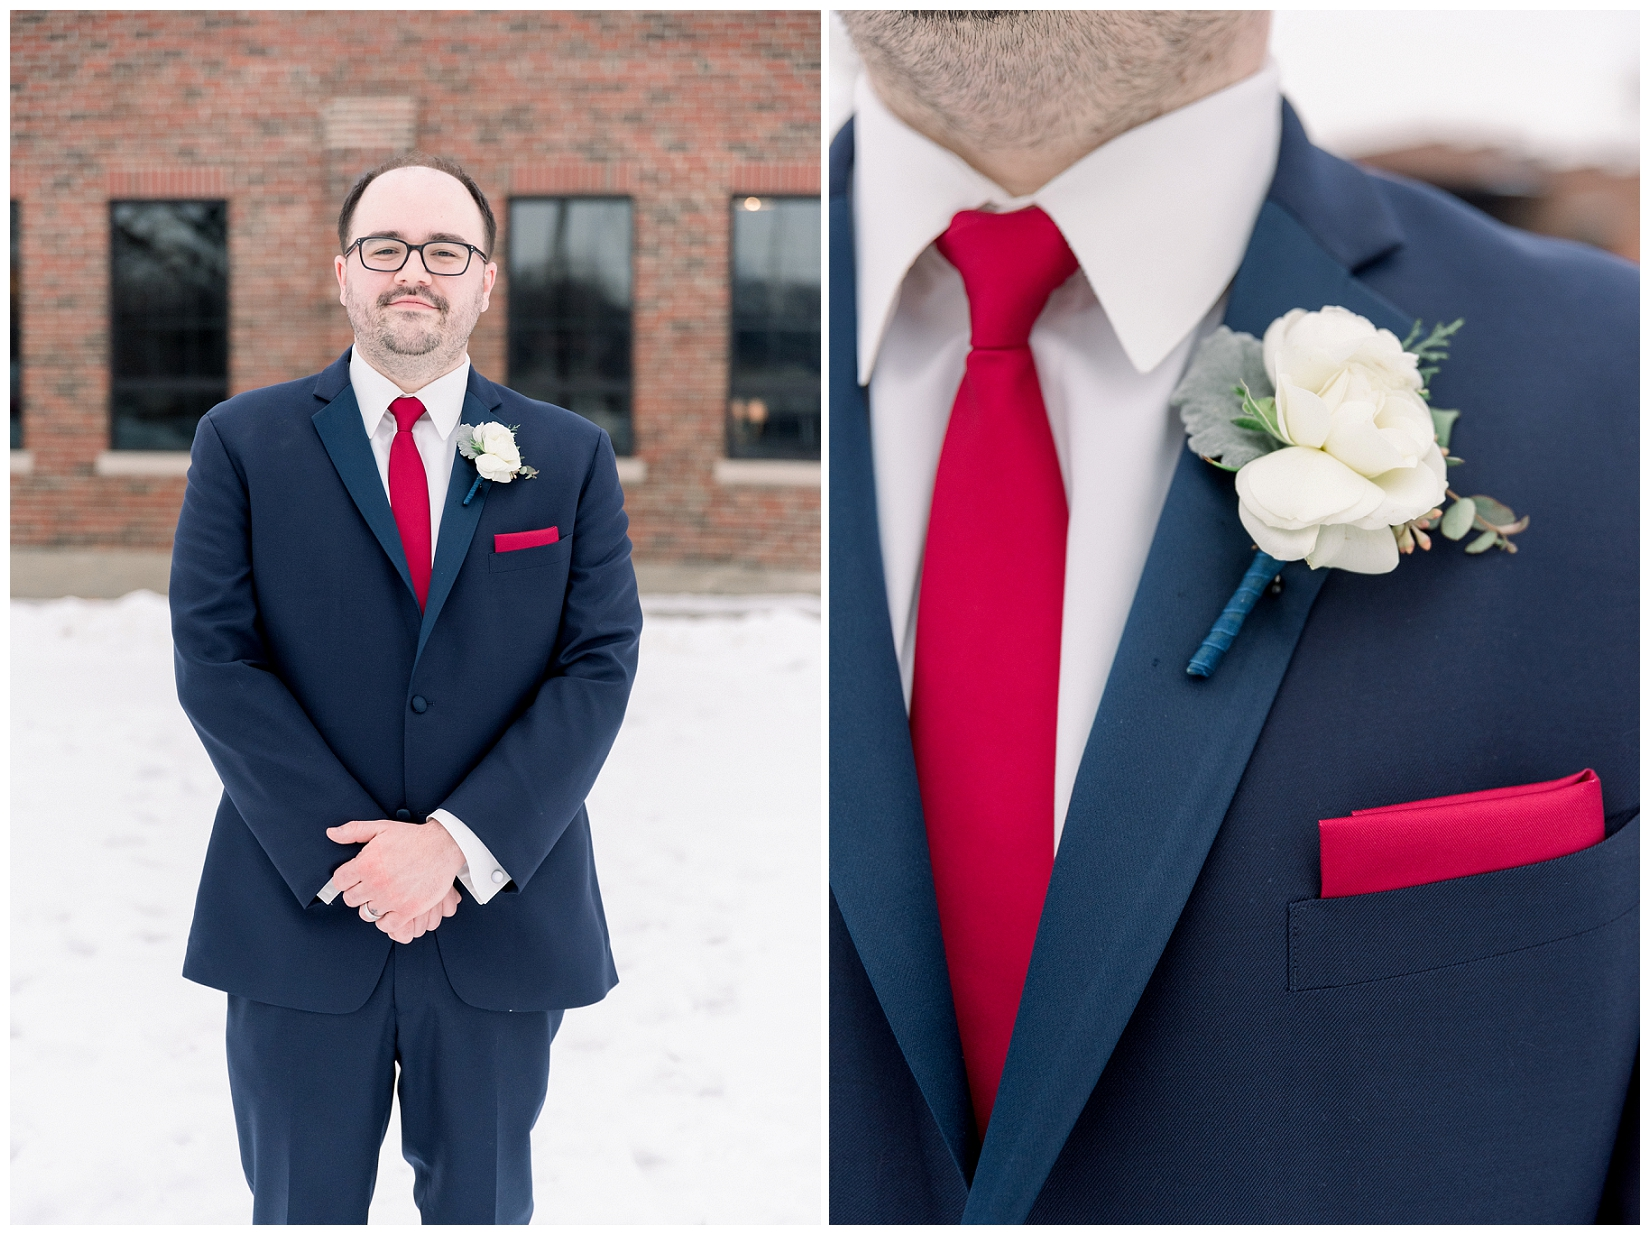 cat-alkire-wedding-photographer-indiana-chicago-indianapolis-fort-wayne_0979.jpg